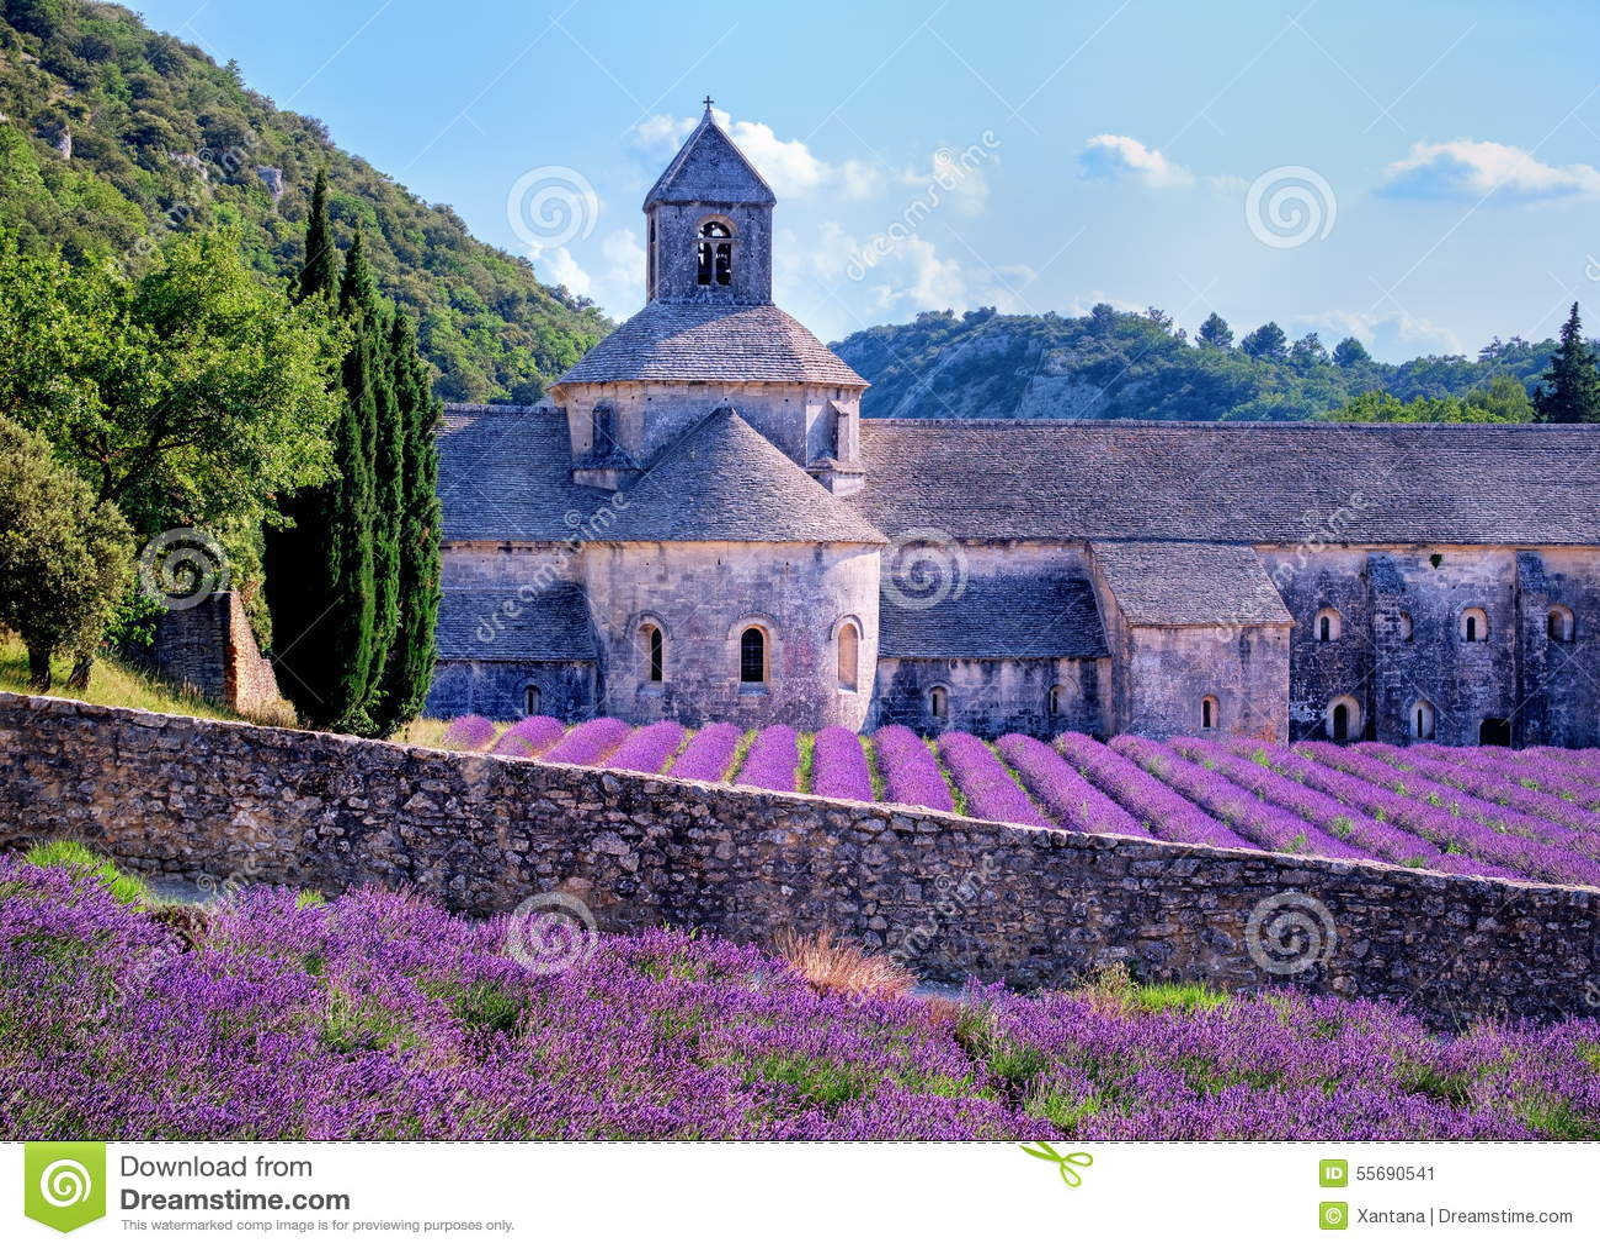 lavender fields provence france stock image image of nature provence 55690541. Black Bedroom Furniture Sets. Home Design Ideas